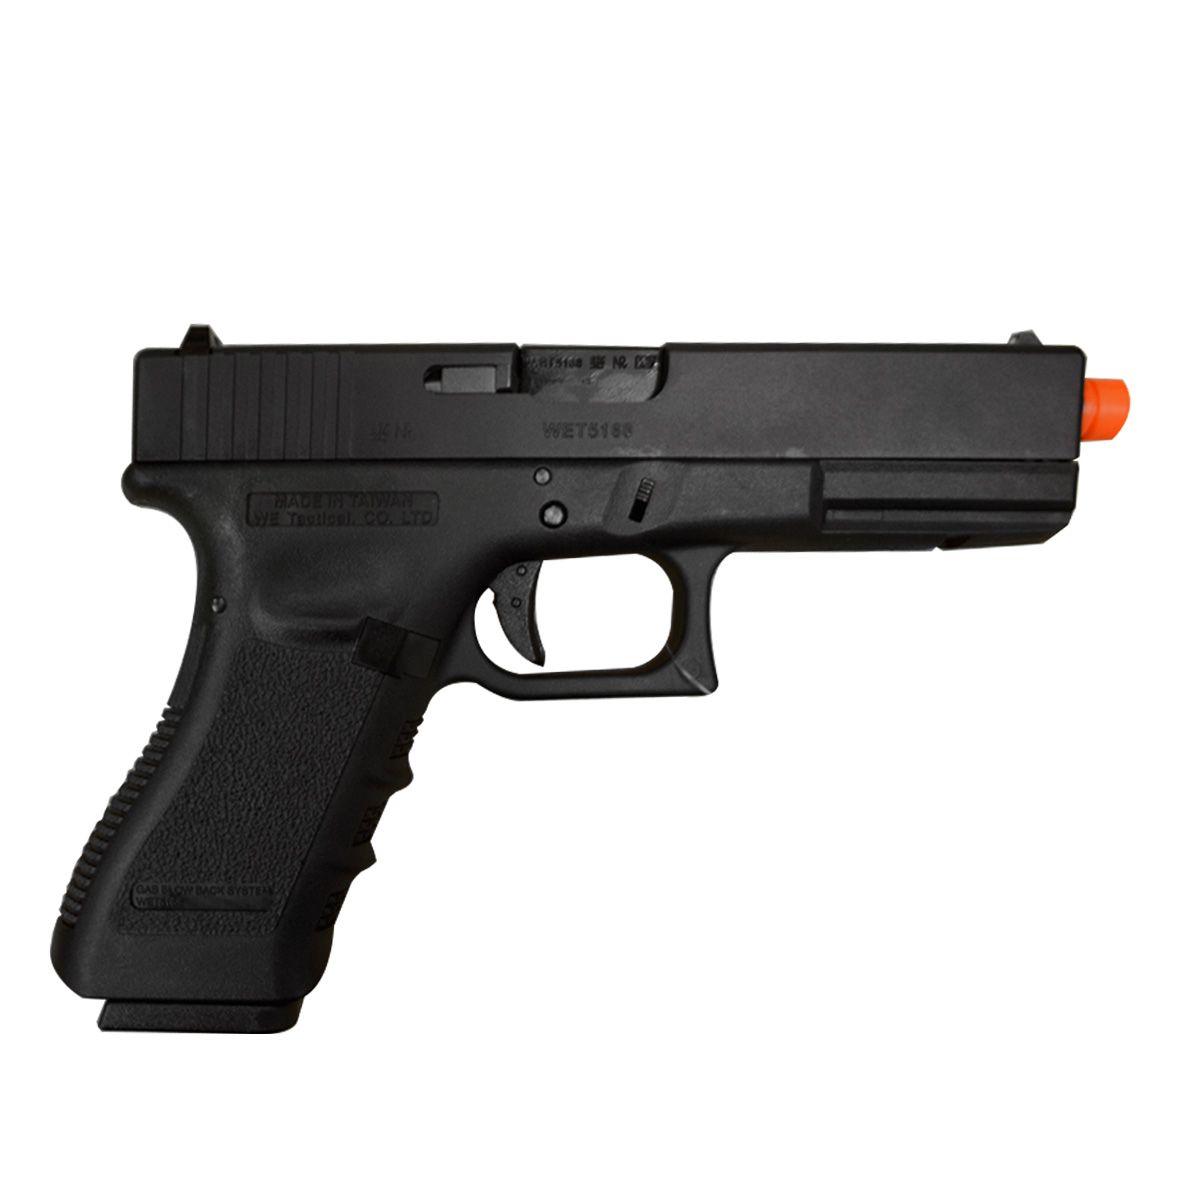 Pistola de Airsoft WE a Gás GBB G17A Blowback GEN 3 Tan 6mm